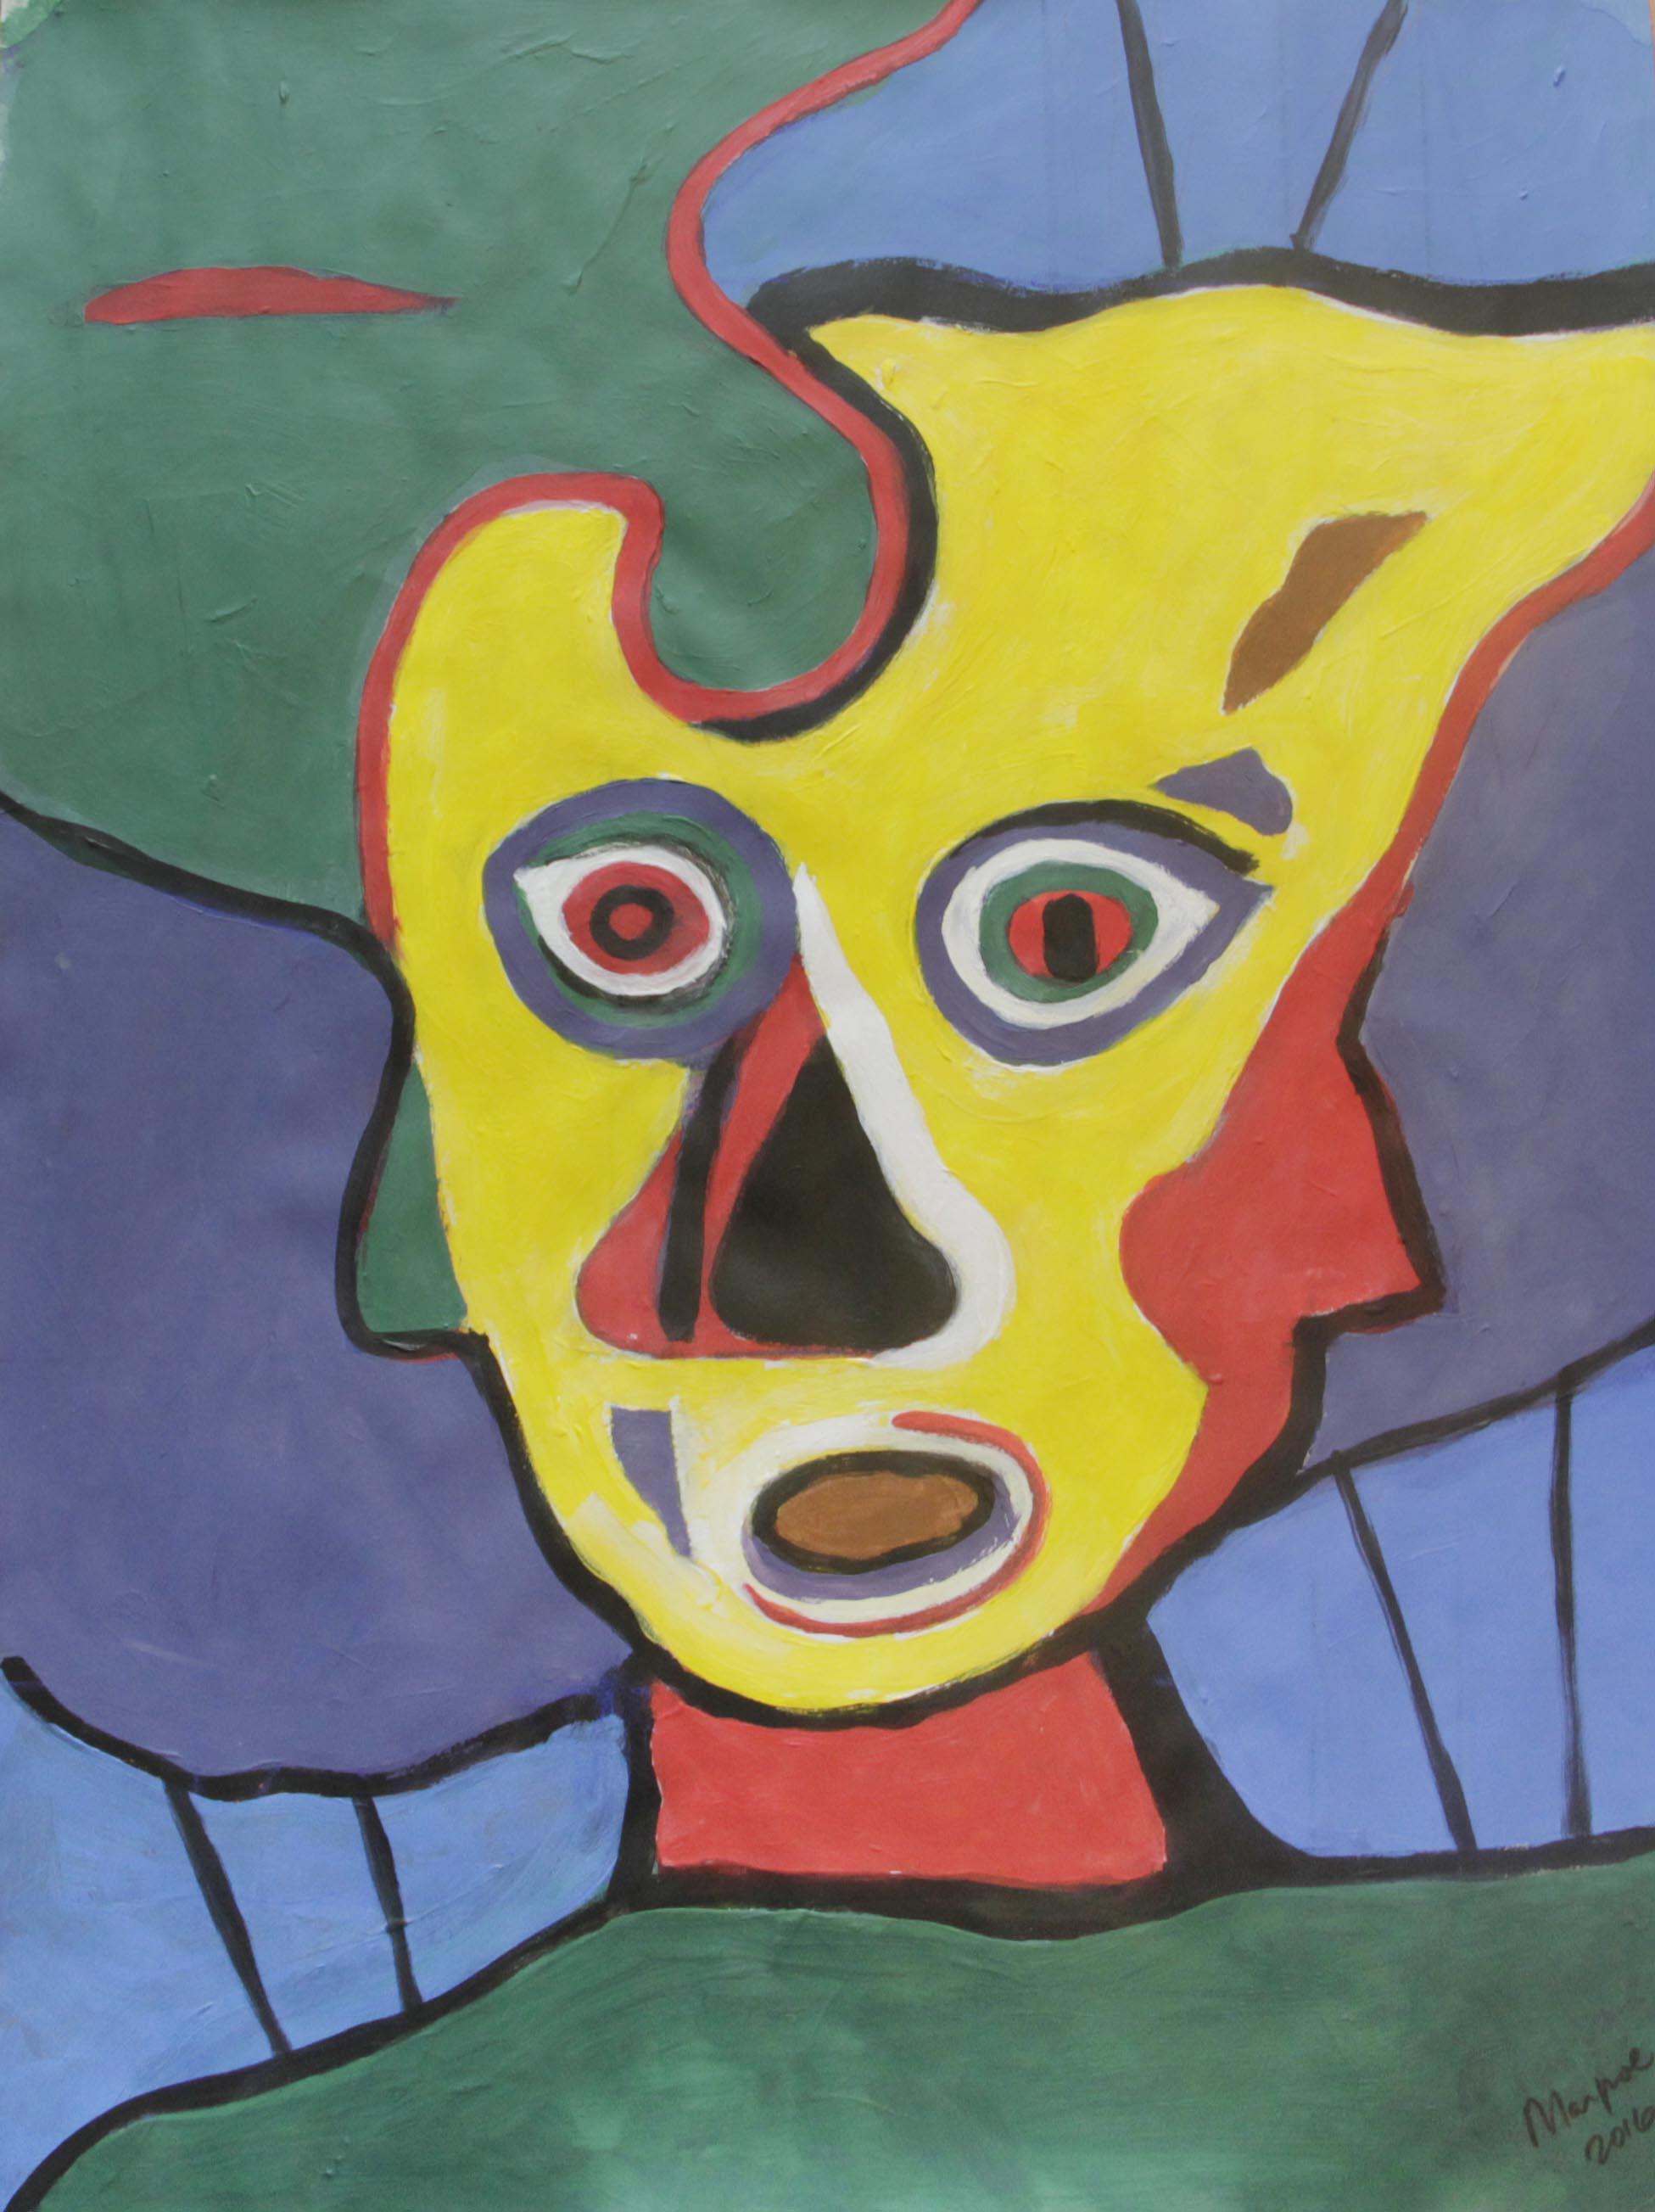 Martin Paul Broenimann, 64x48